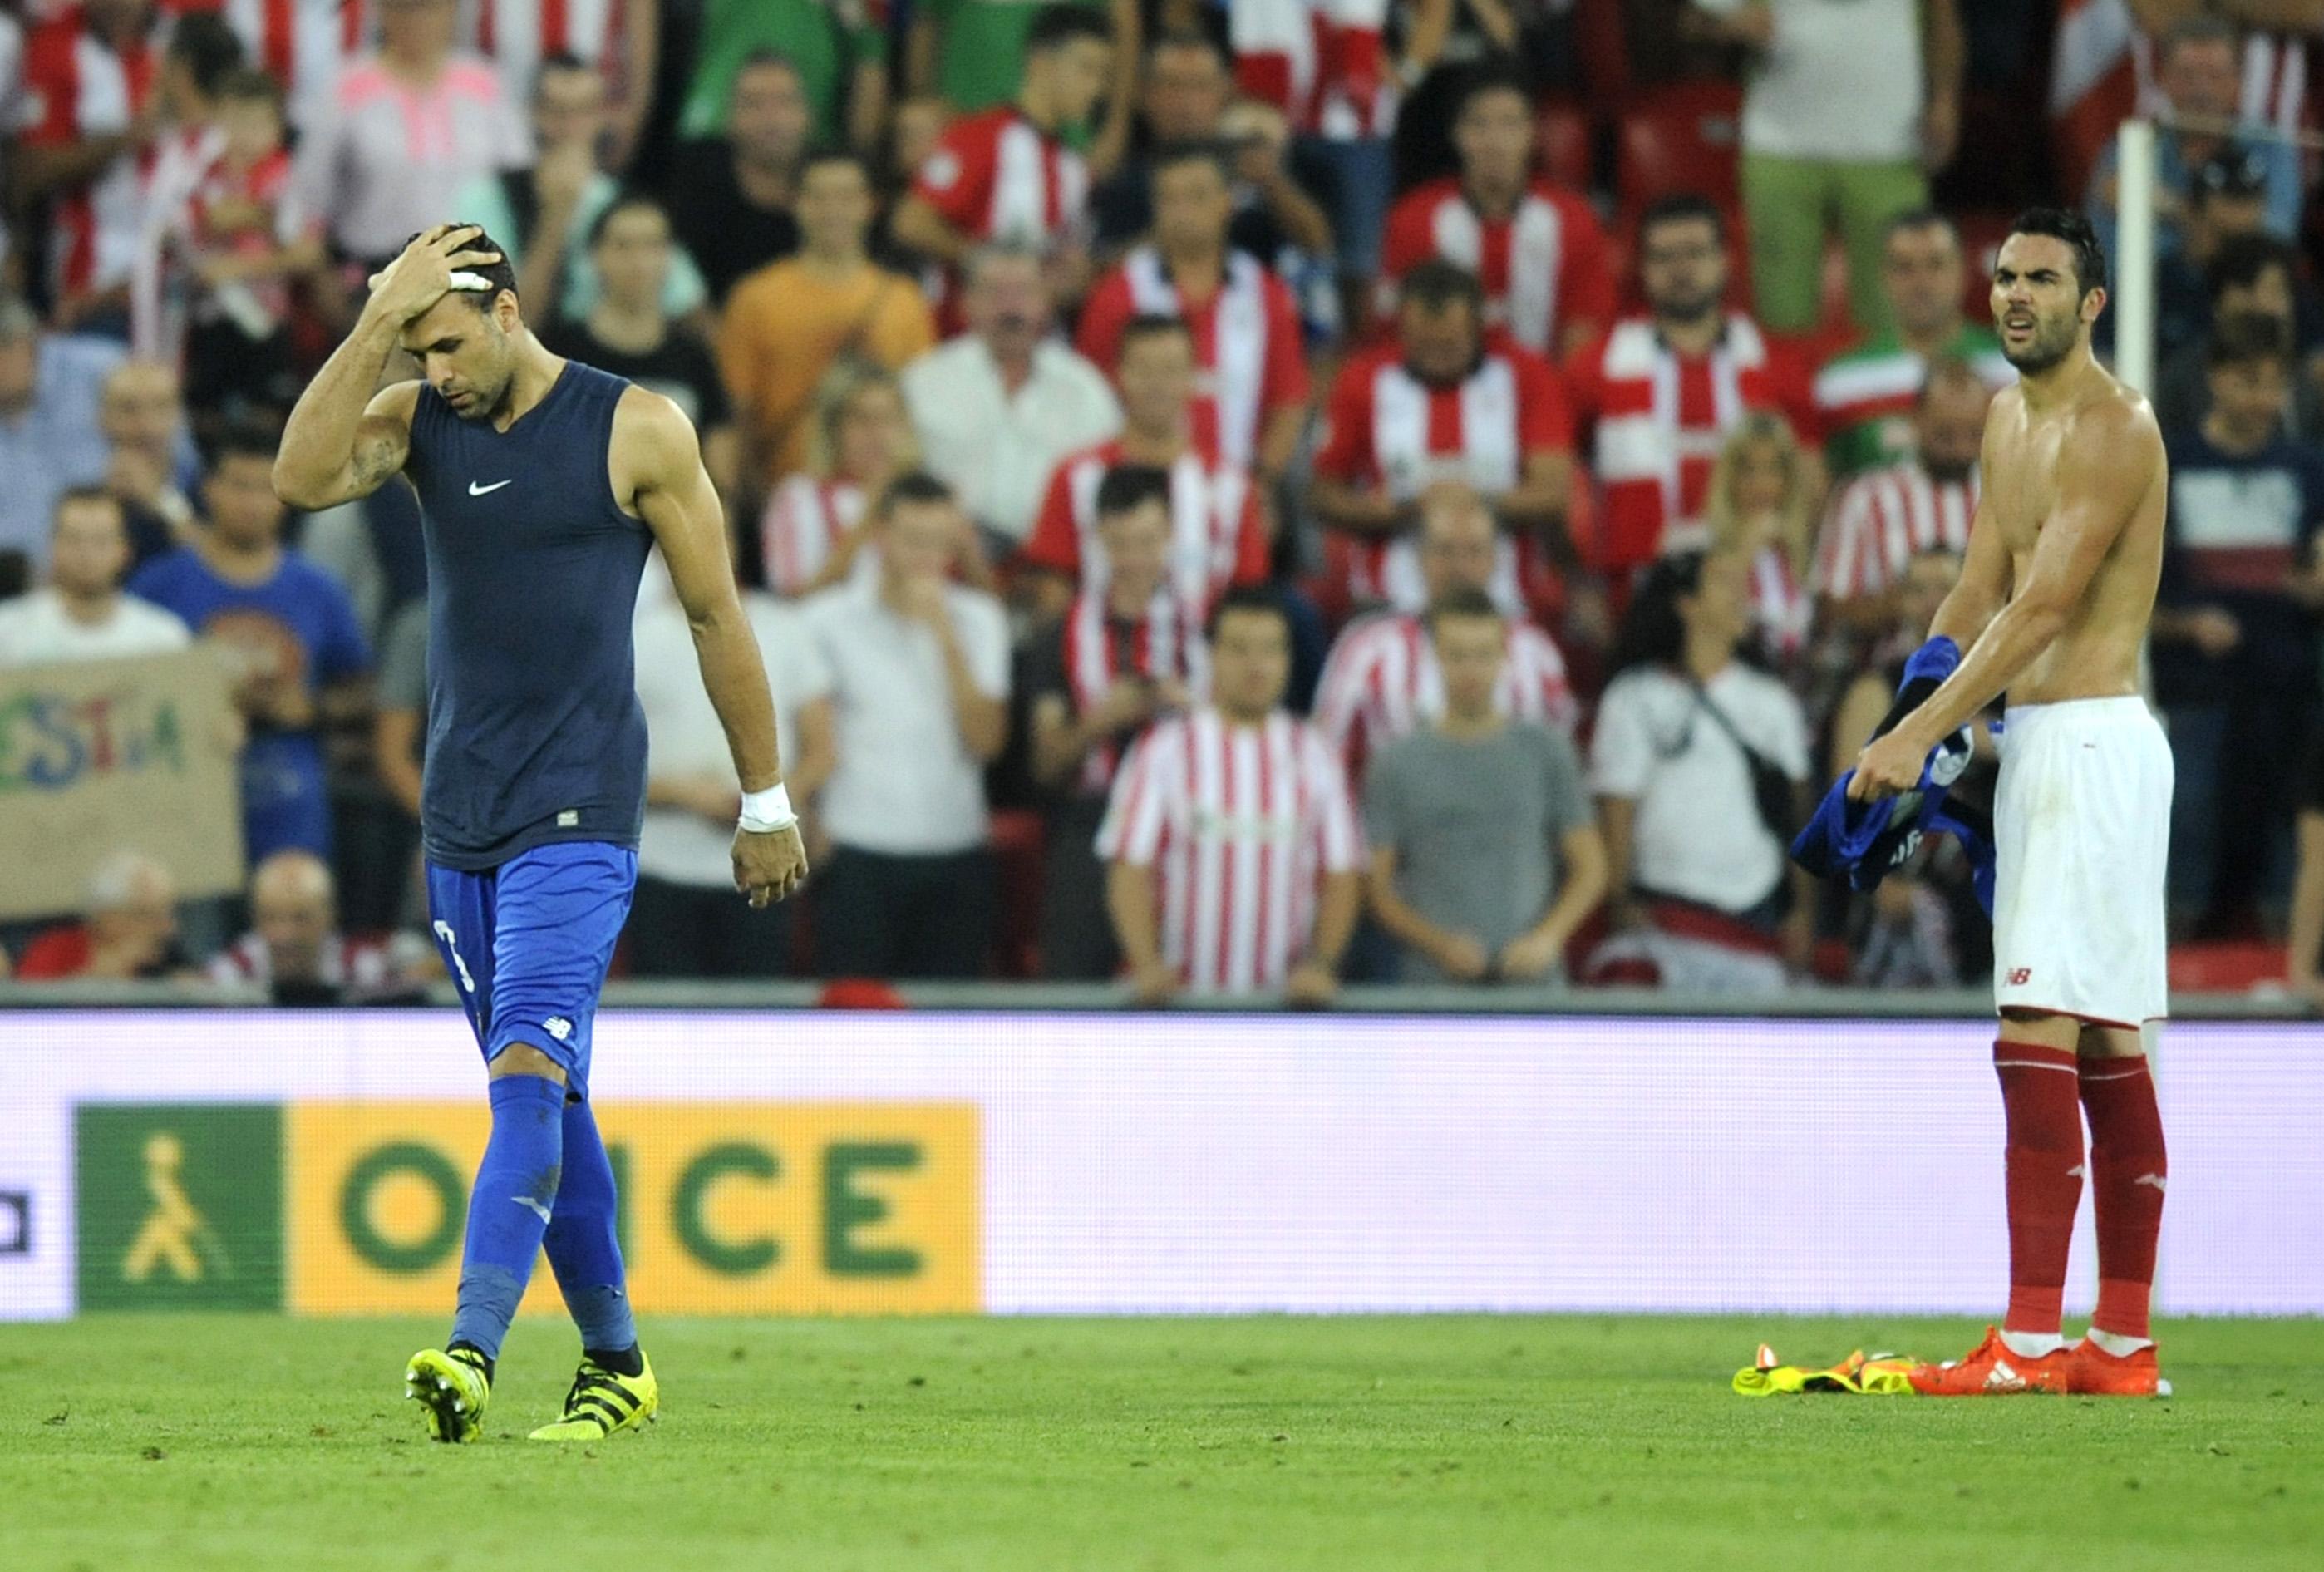 Football - Etranger - Sirigu craque totalement en fin de match (vidéo)